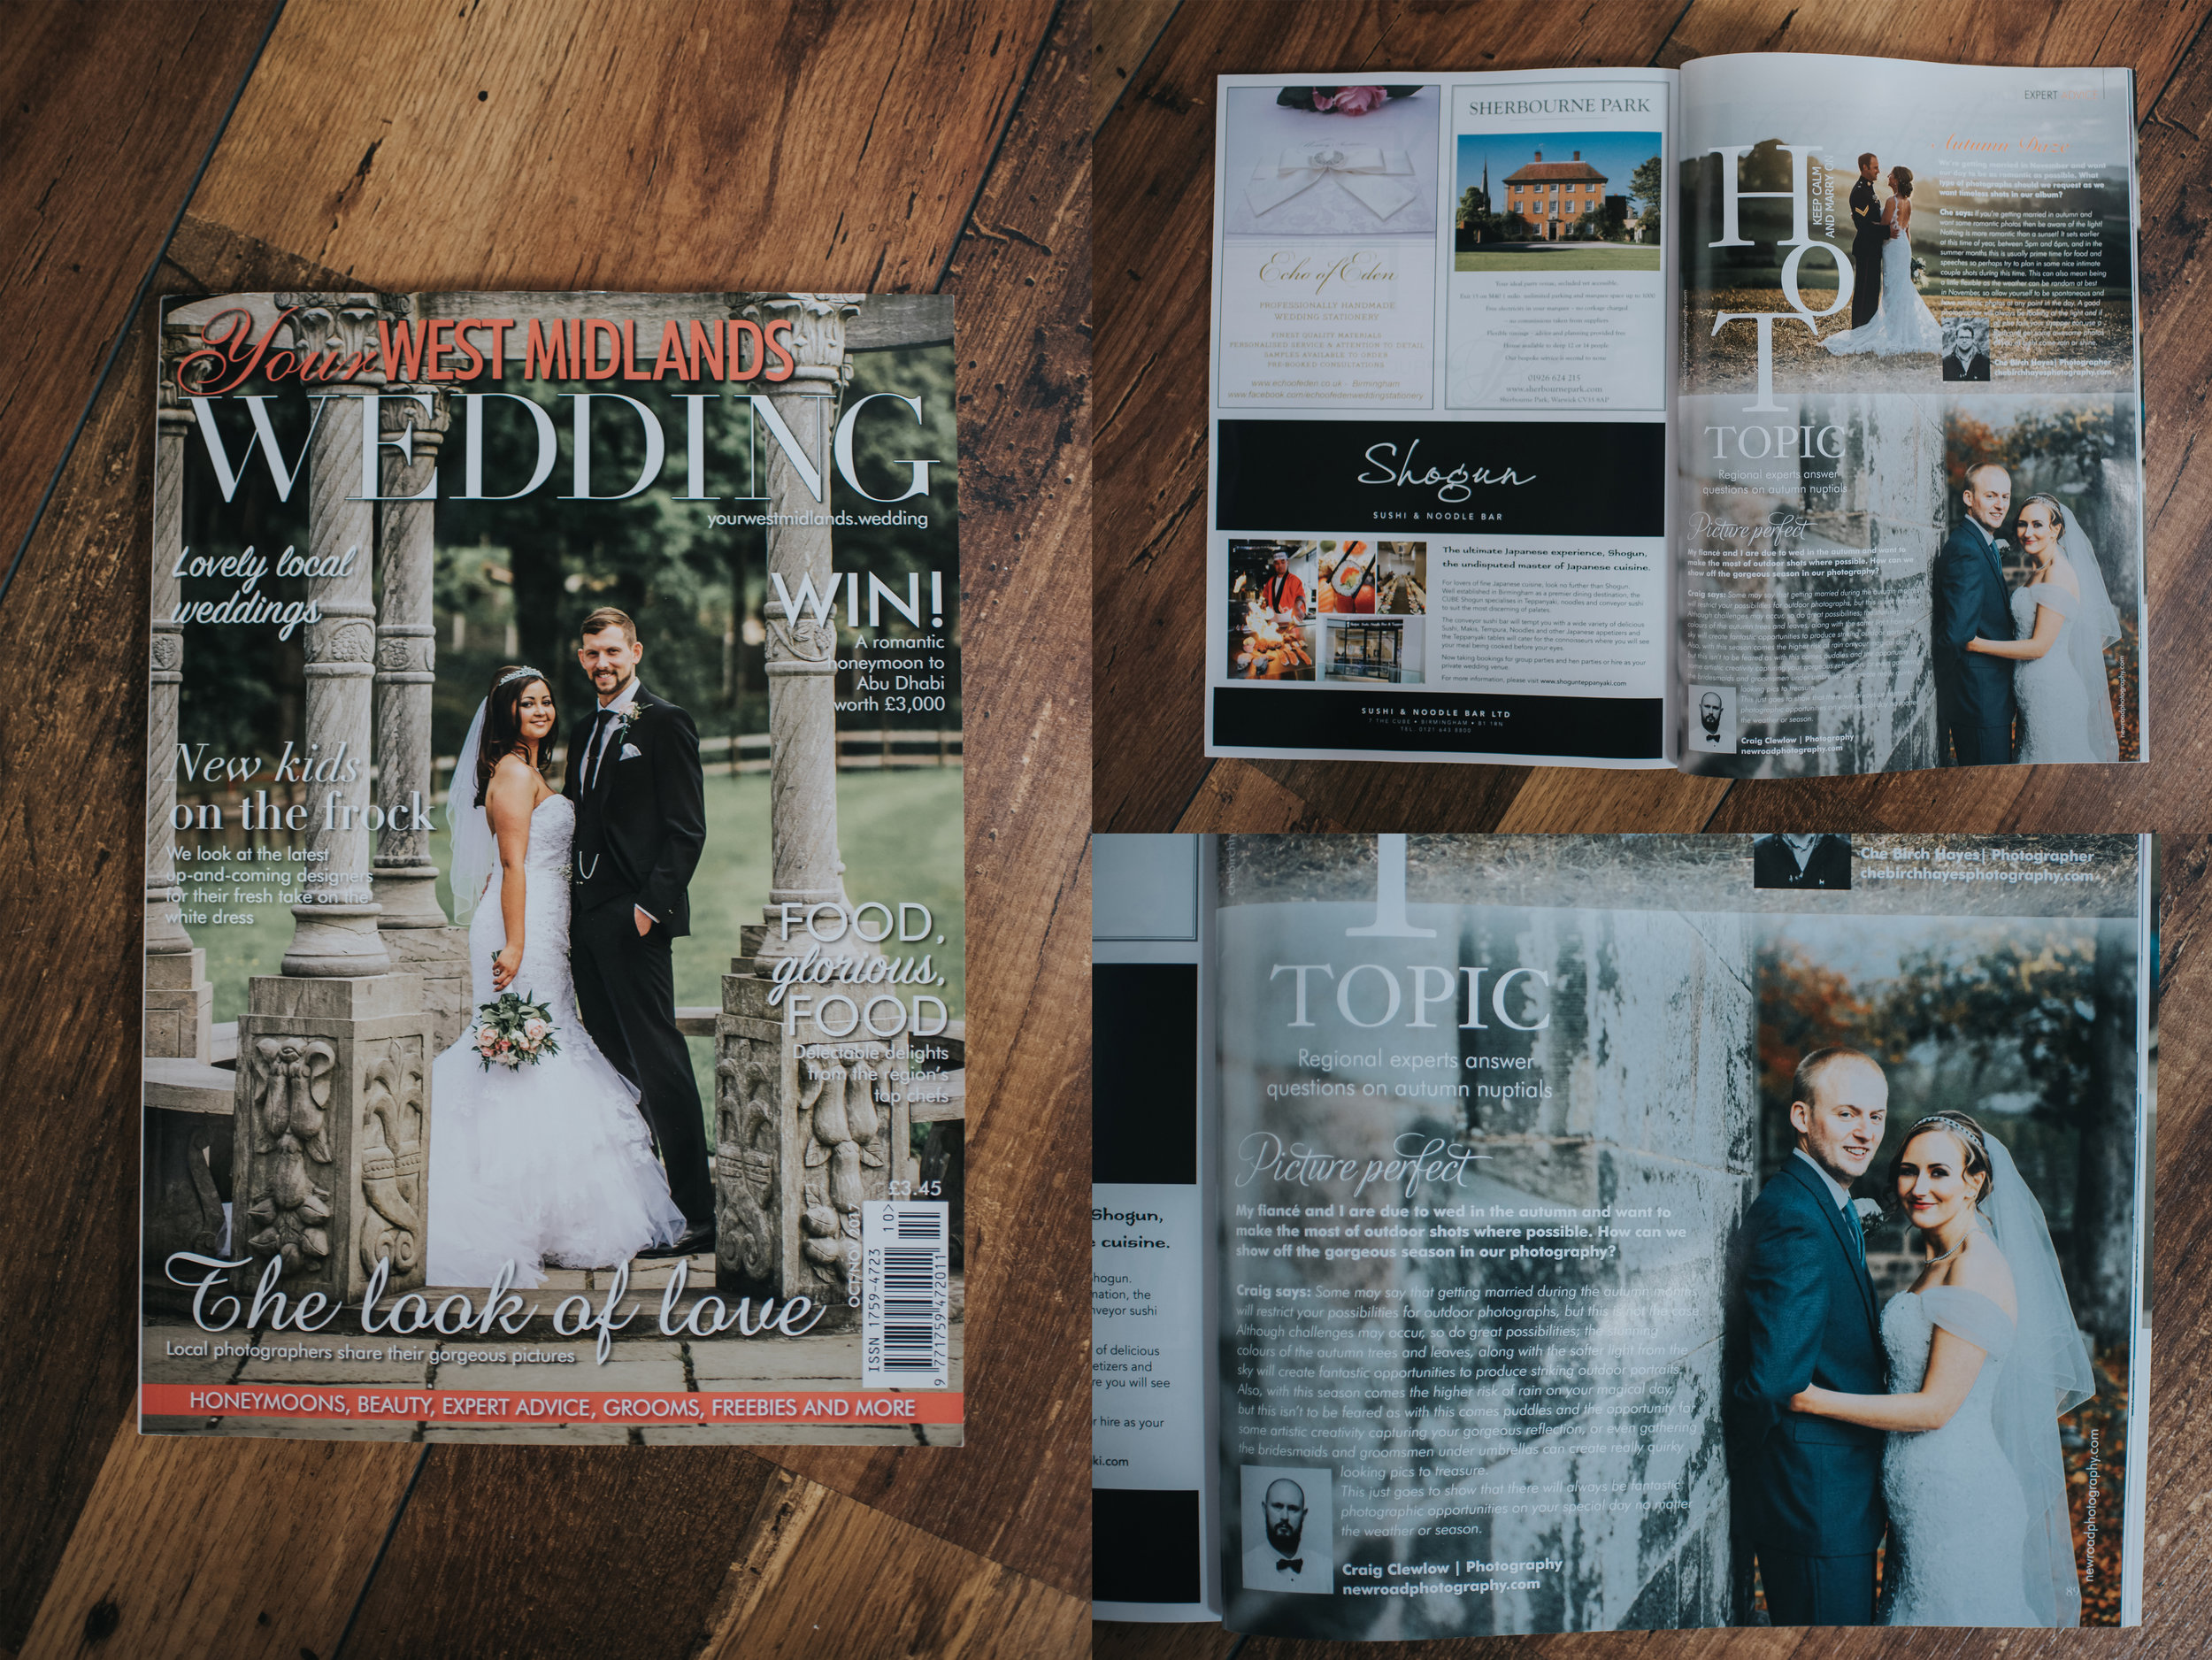 October issue of Your West Midlands Wedding Magazine